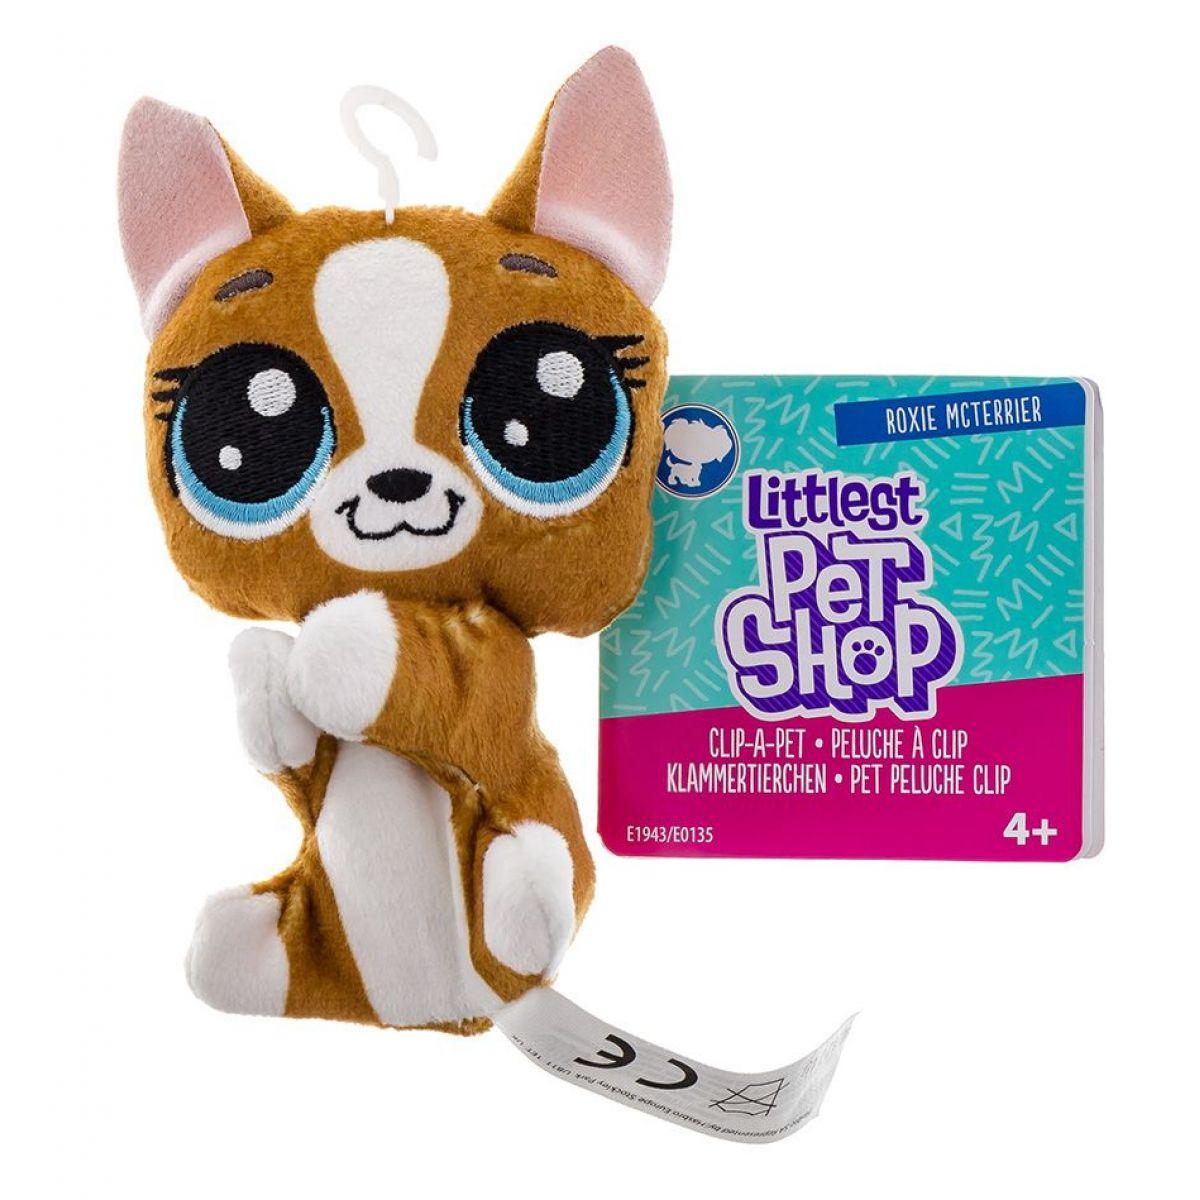 Littlest Pet Shop Plyšák s klipem Roxie Mcterrier